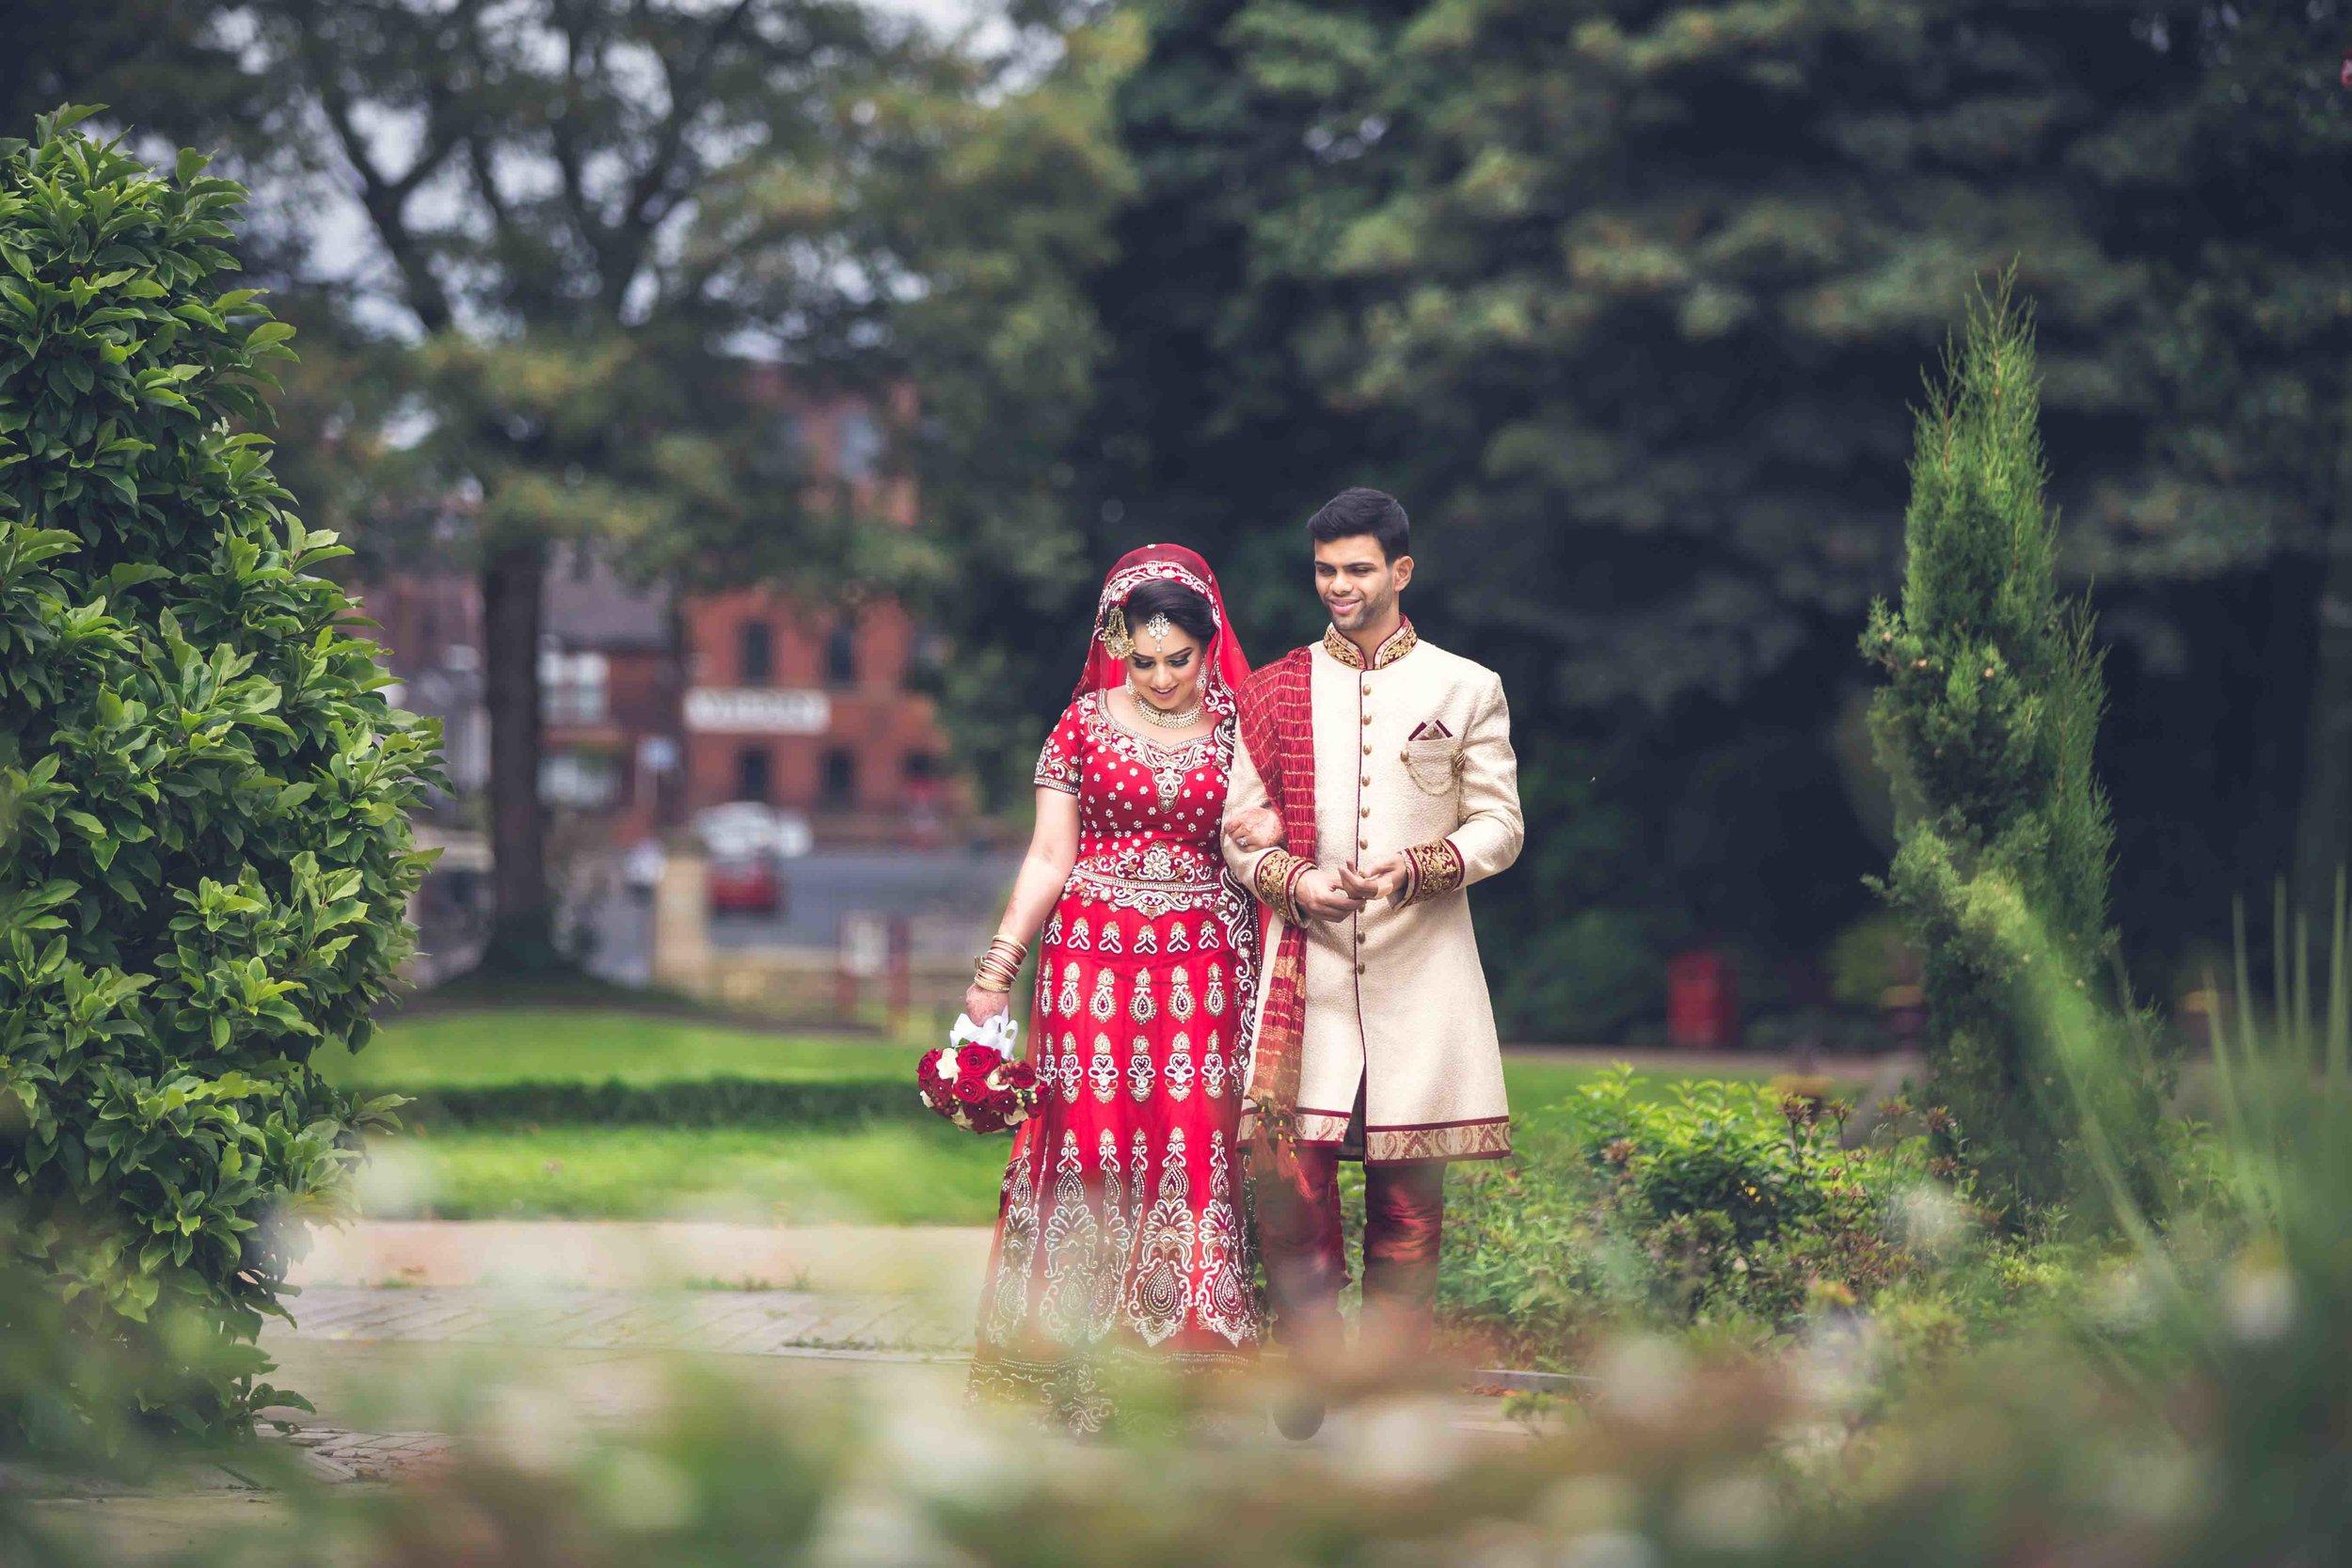 Asian Wedding Photographer Opu Sultan Photography Lyme Park Scotland Edinburgh Glasgow London Manchester Liverpool Birmingham Wedding Photos prewed shoot Jams & Tams Blod-26.jpg